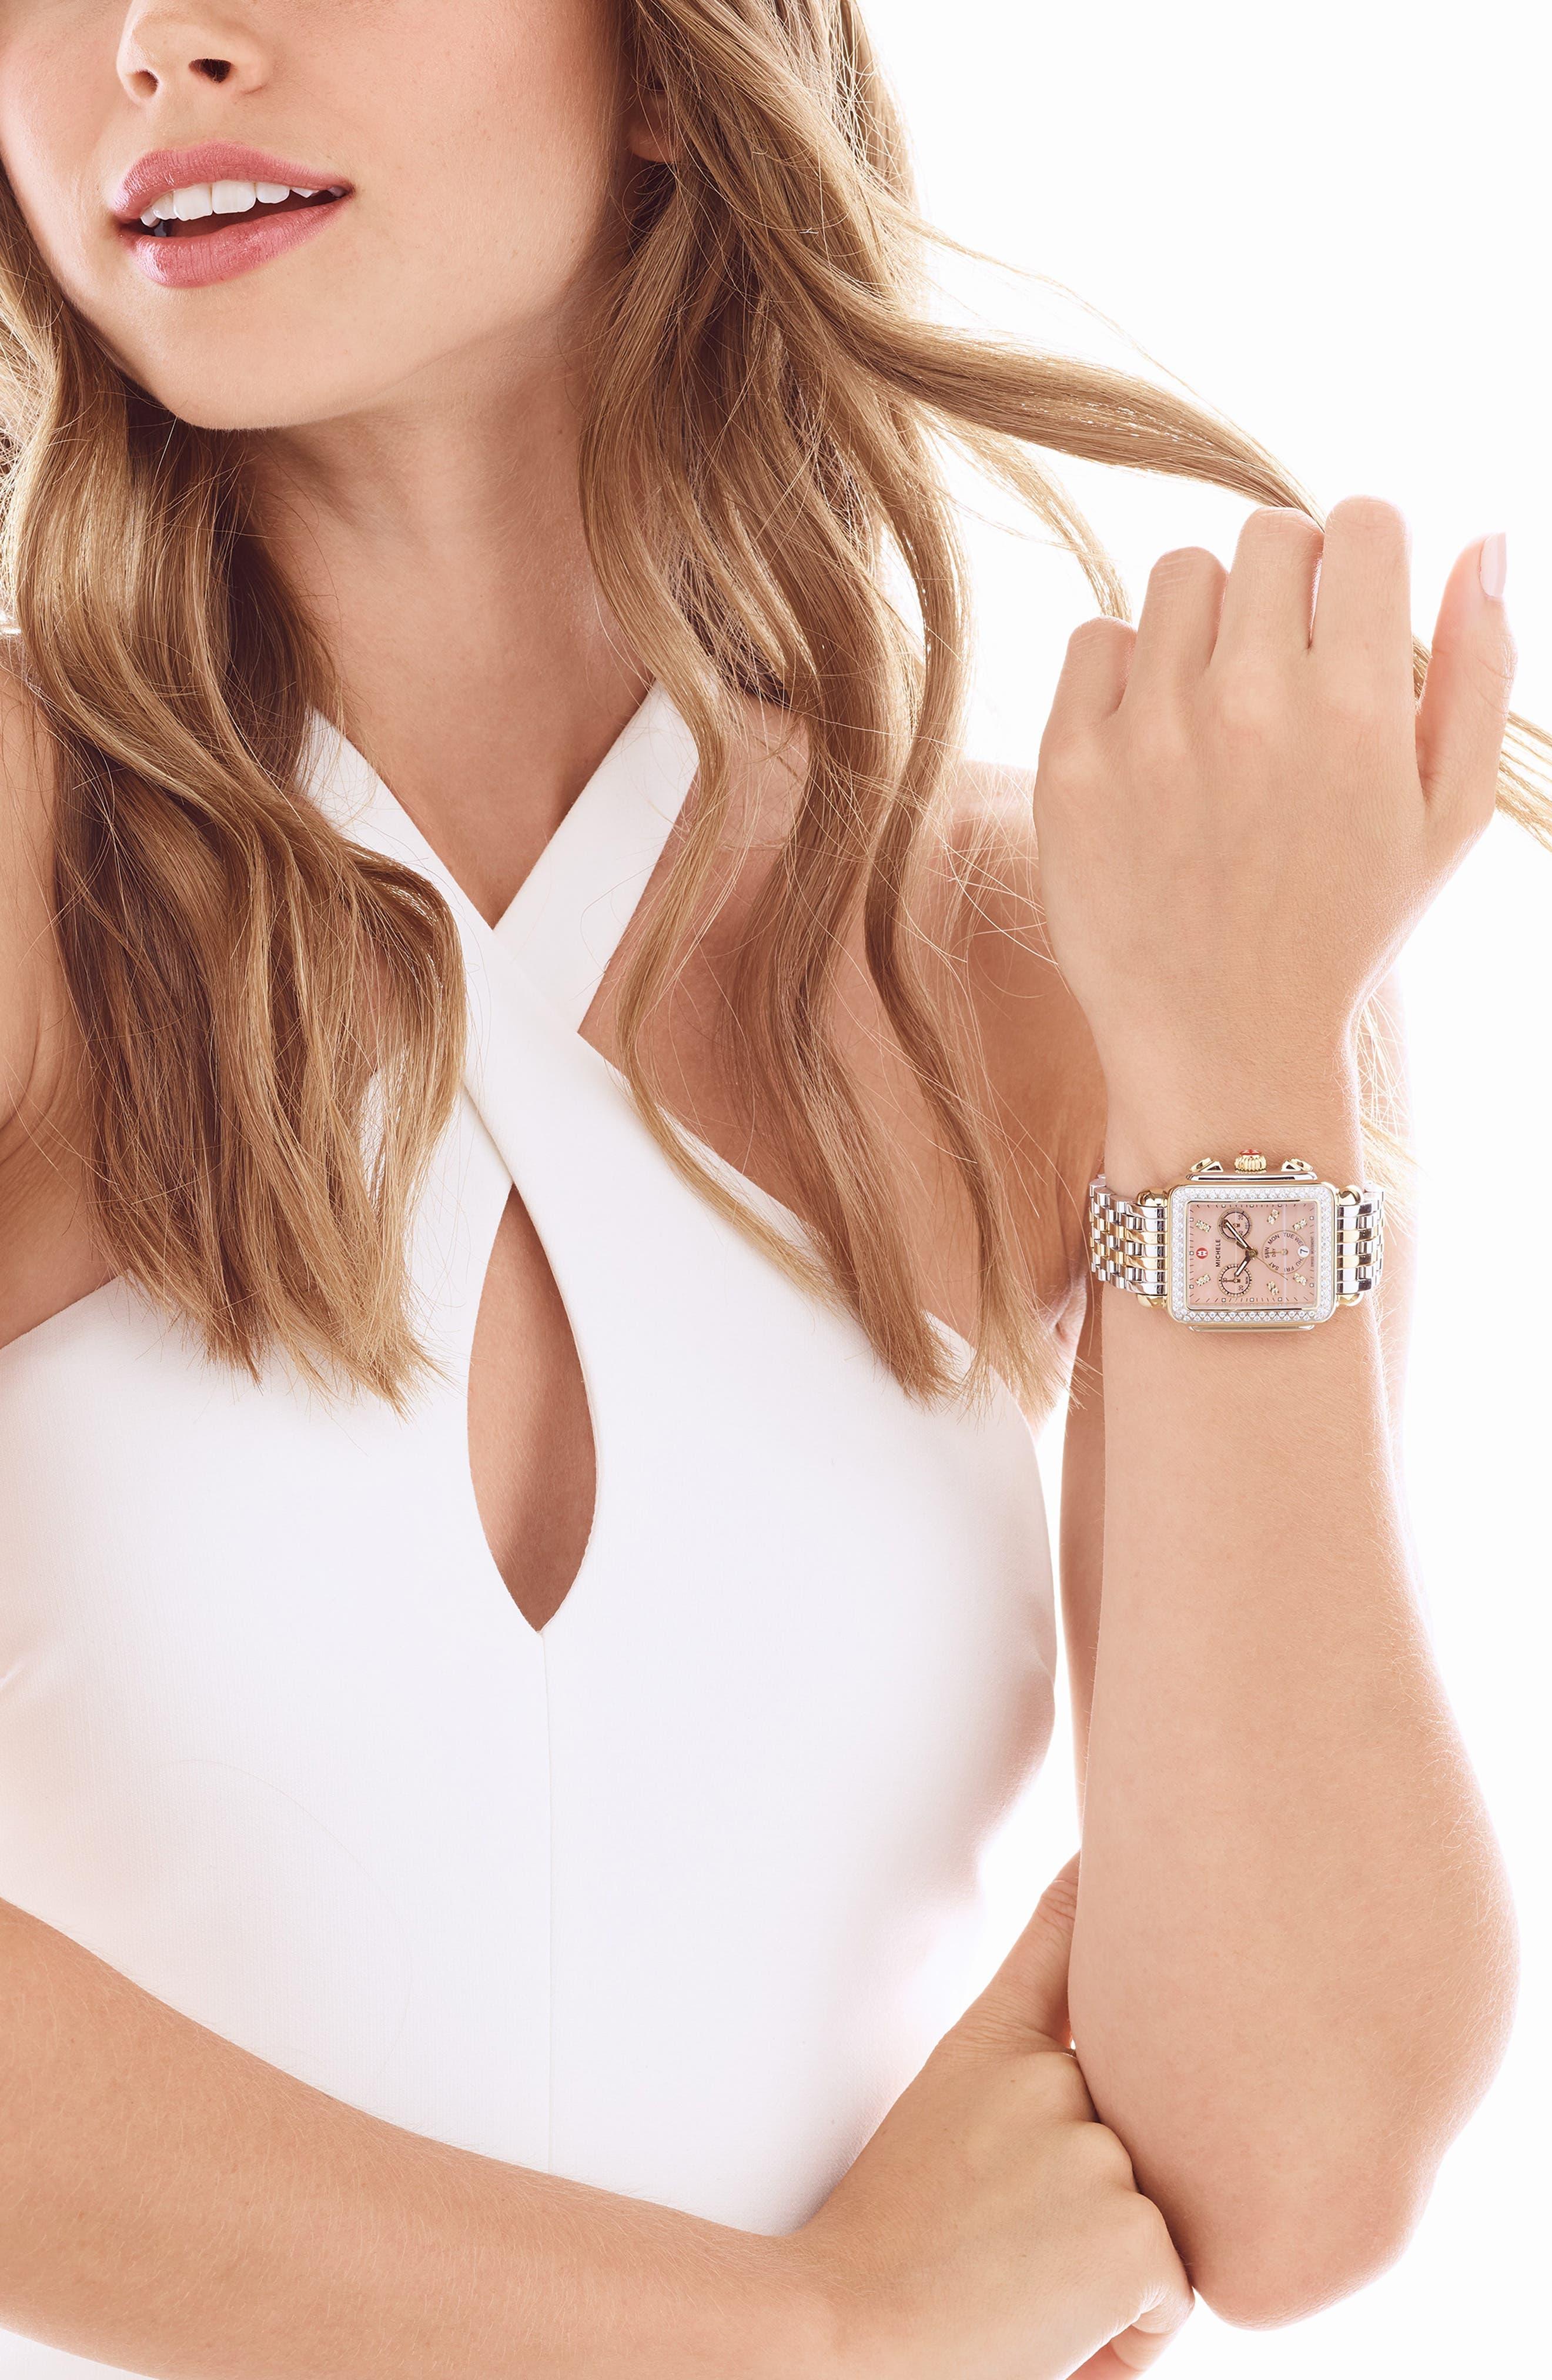 Deco Diamond Diamond Dial Watch Head, 33mm x 35mm,                             Alternate thumbnail 2, color,                             GOLD/ SILVER/ DESERT ROSE MOP